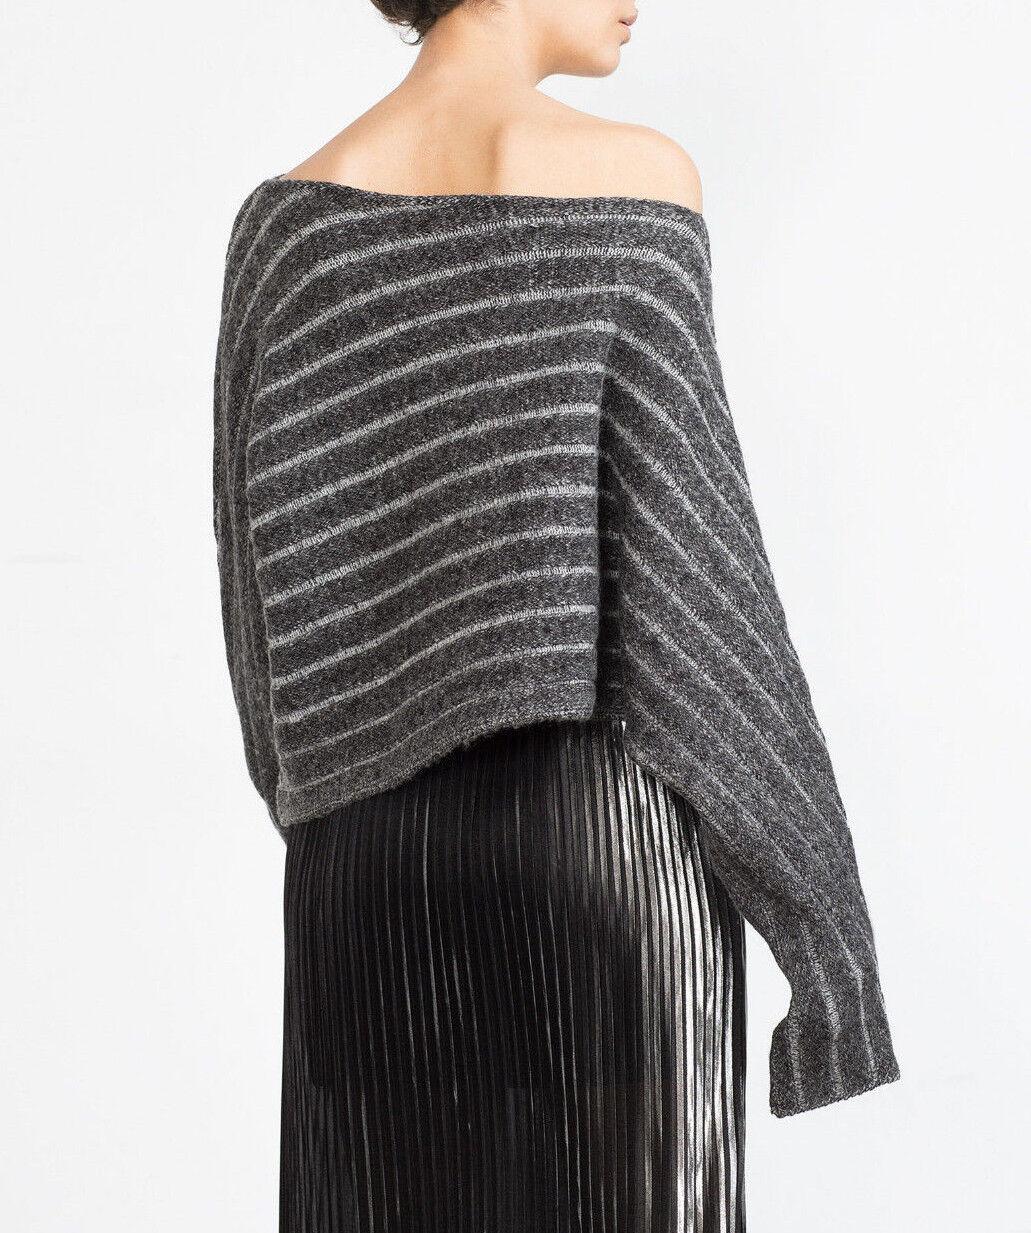 Zara assymetrischer Pullover Poncho Fancy Knit Asymmetric HEM SWEATER Dimensione S M